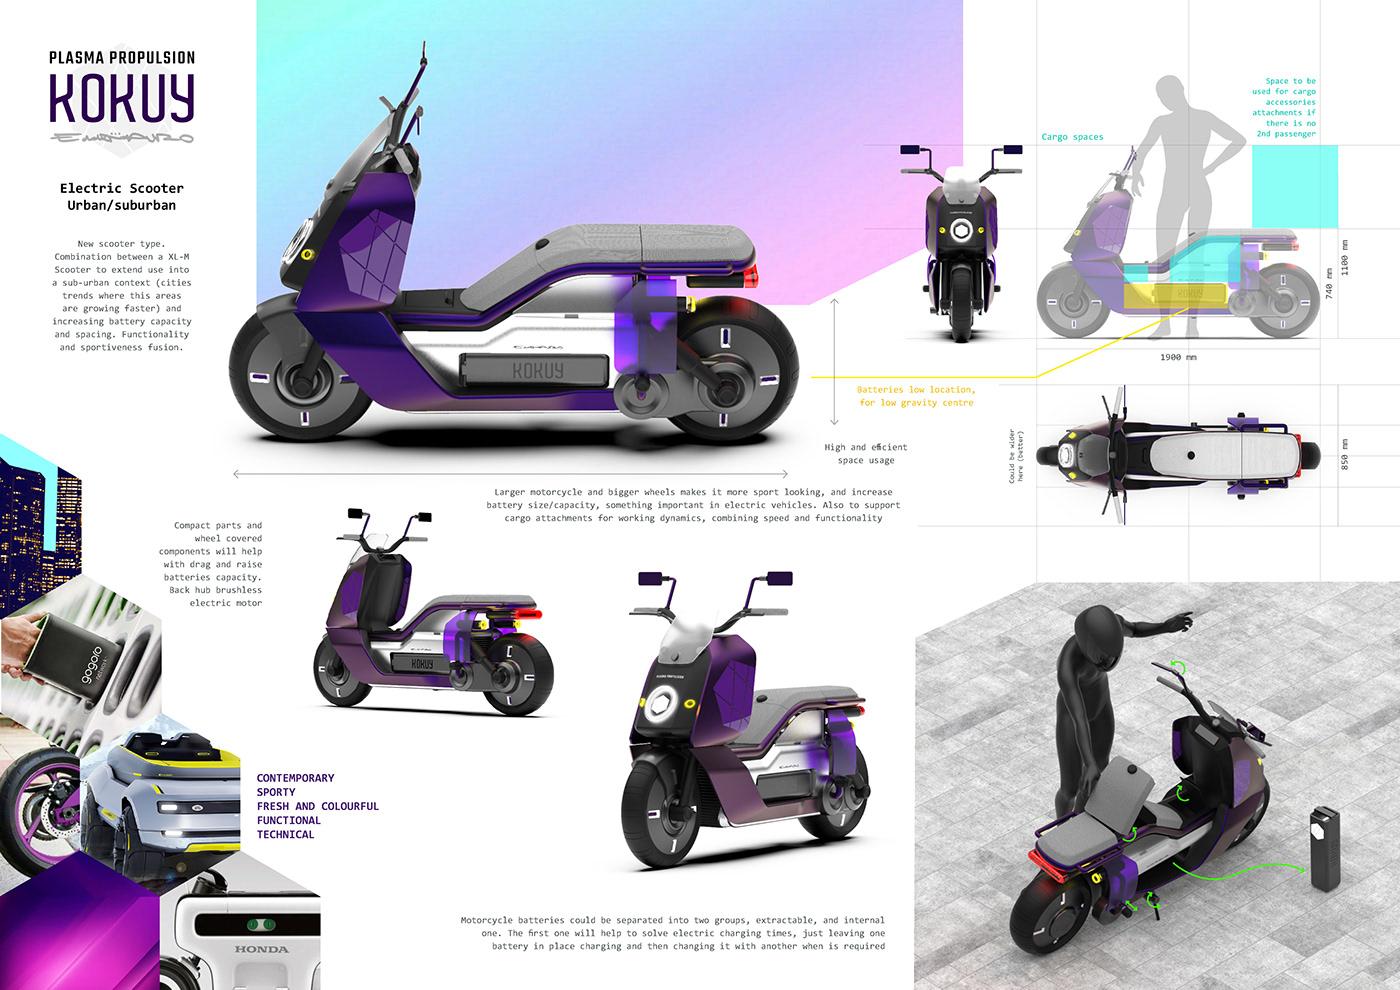 Scooter electric all terrain KOKUY motorcycle Latin America moto motocicleta